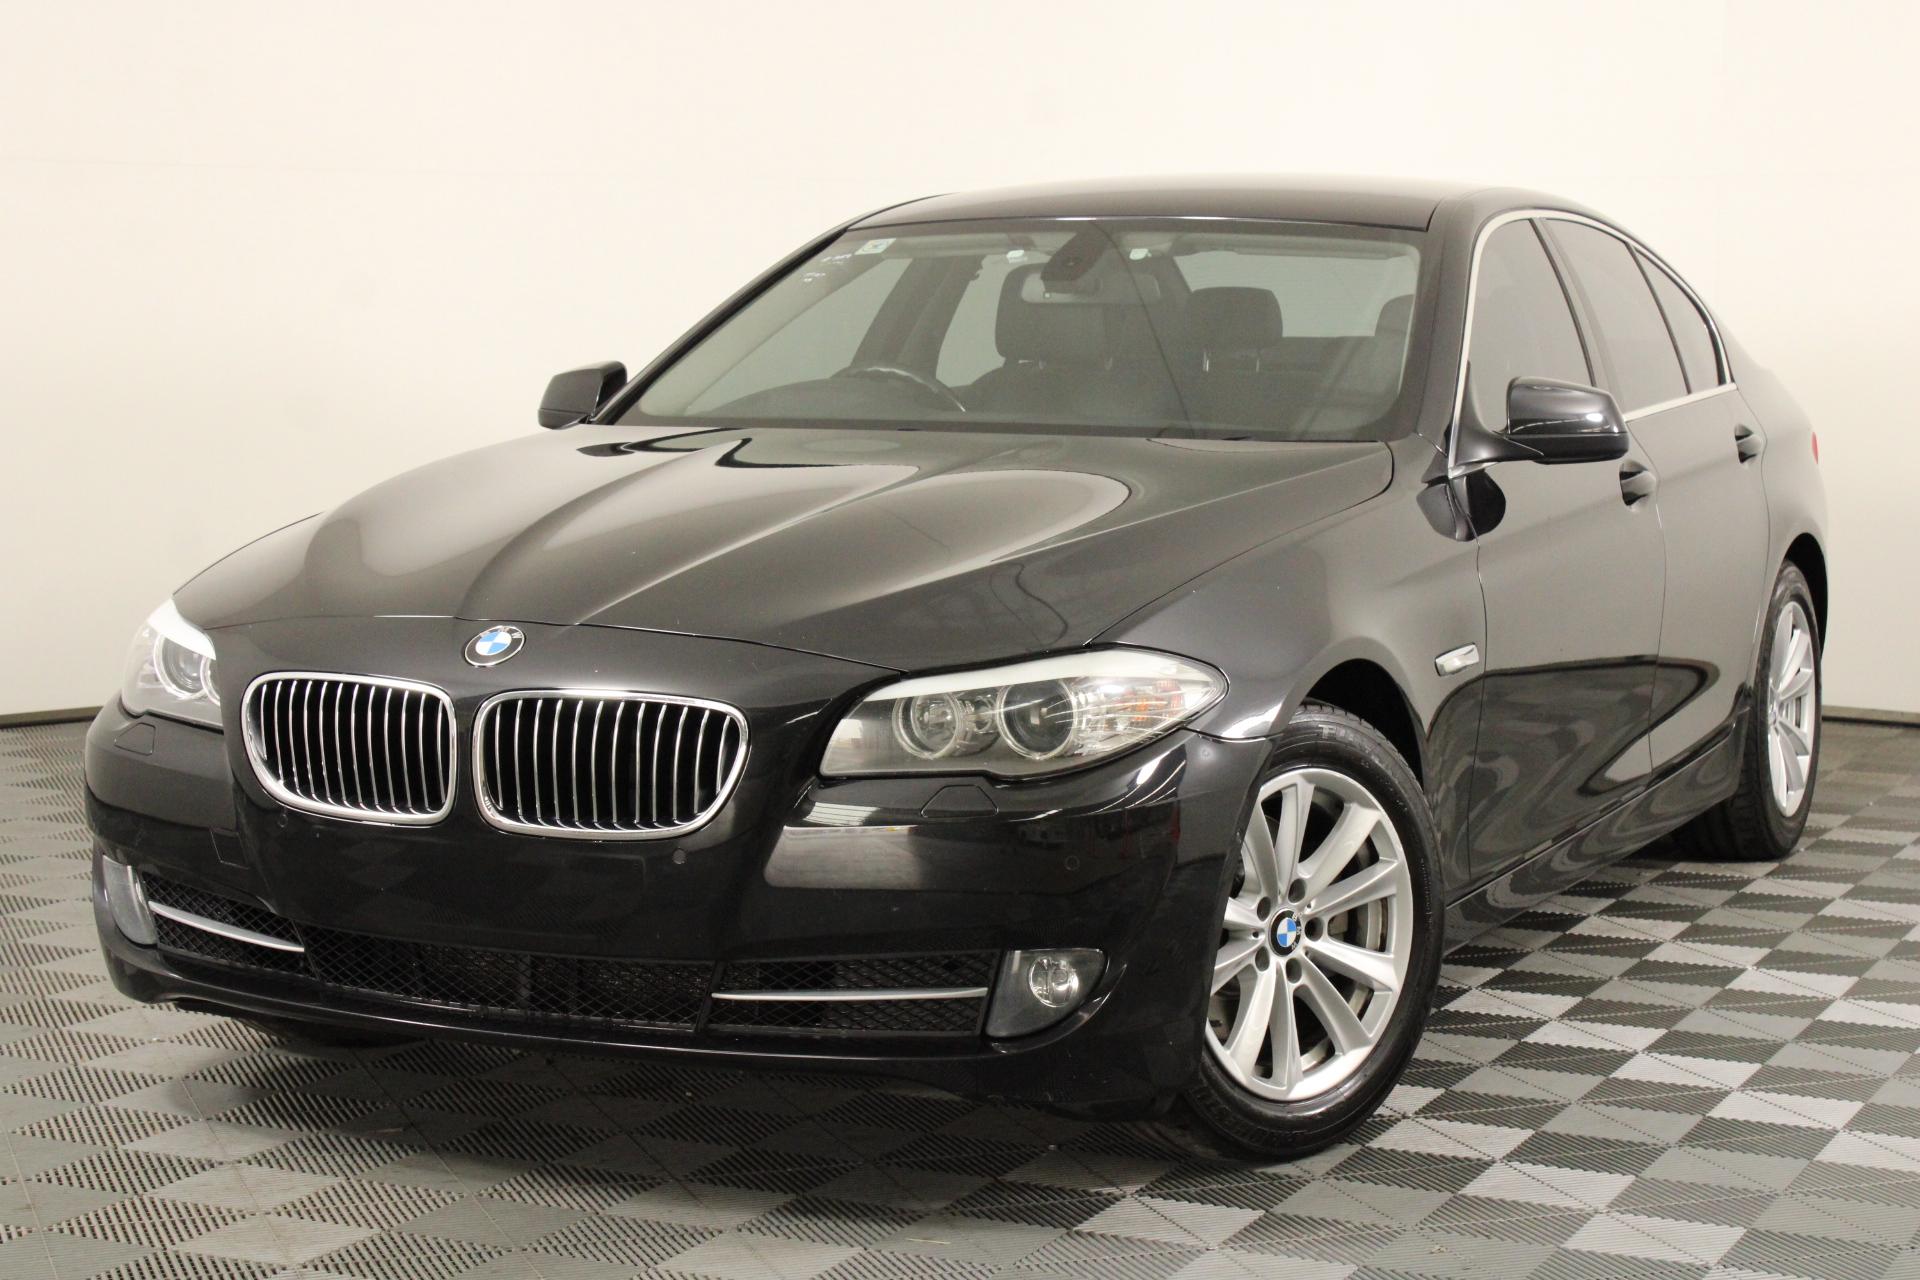 2010 BMW 5 20d F10 Turbo Diesel Automatic - 8 Speed Sedan